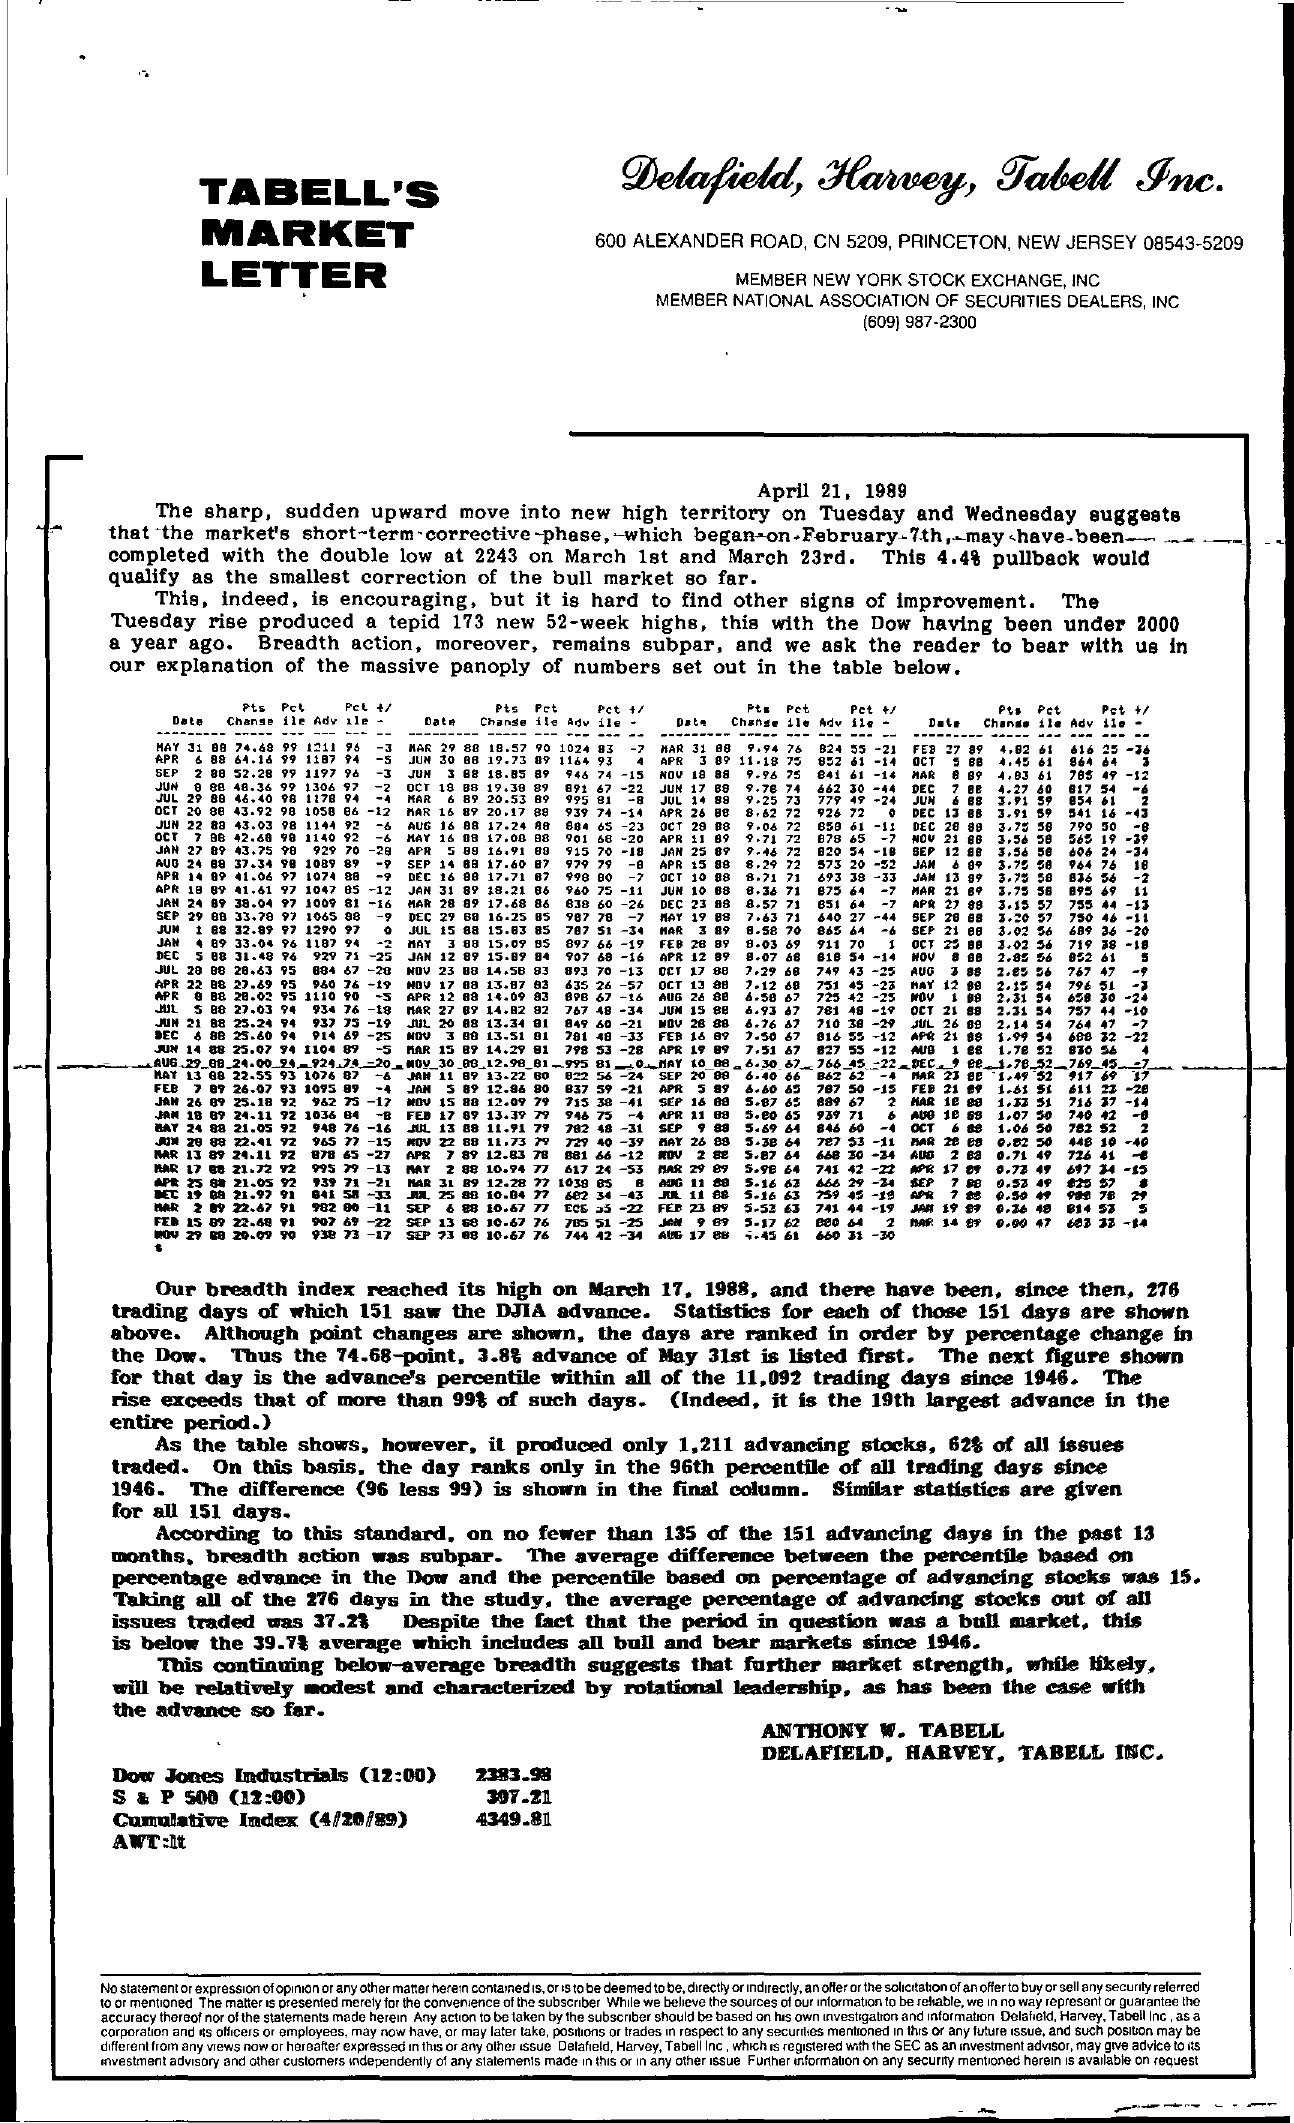 Tabell's Market Letter - April 21, 1989